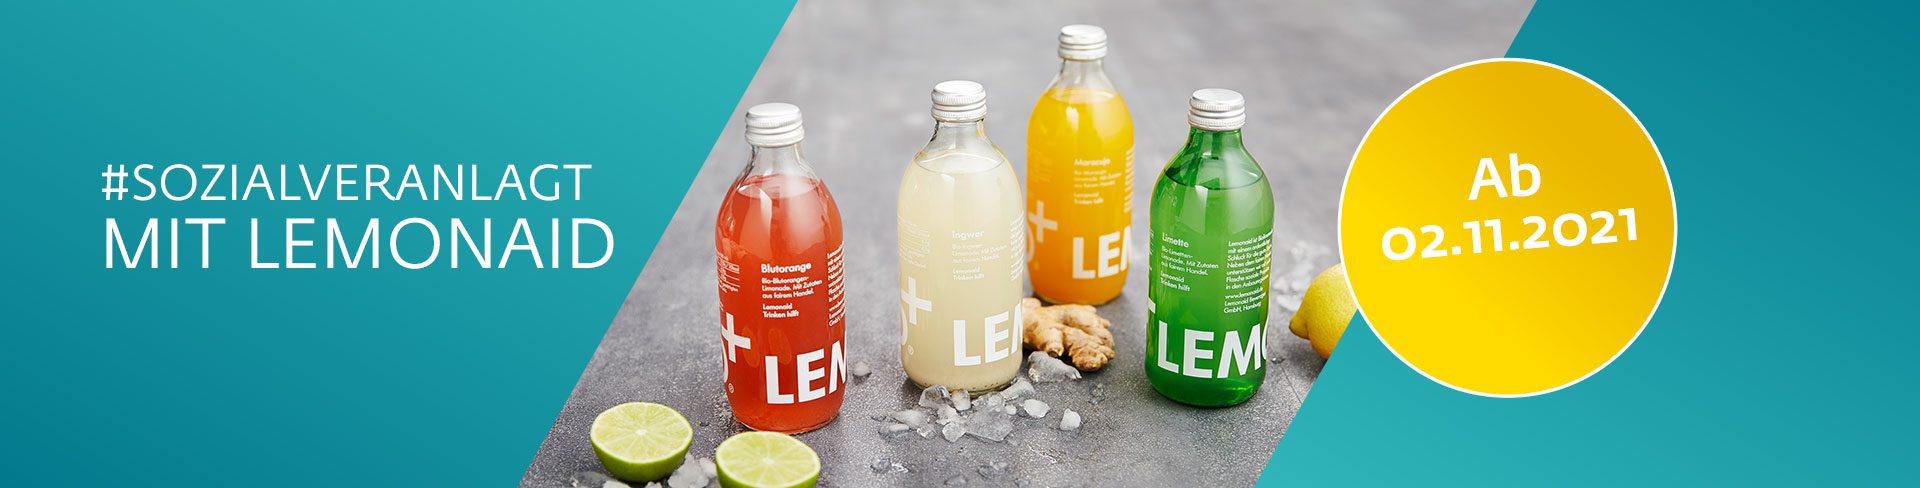 Lemonaid ab 2.11.2021 bei WIWIN